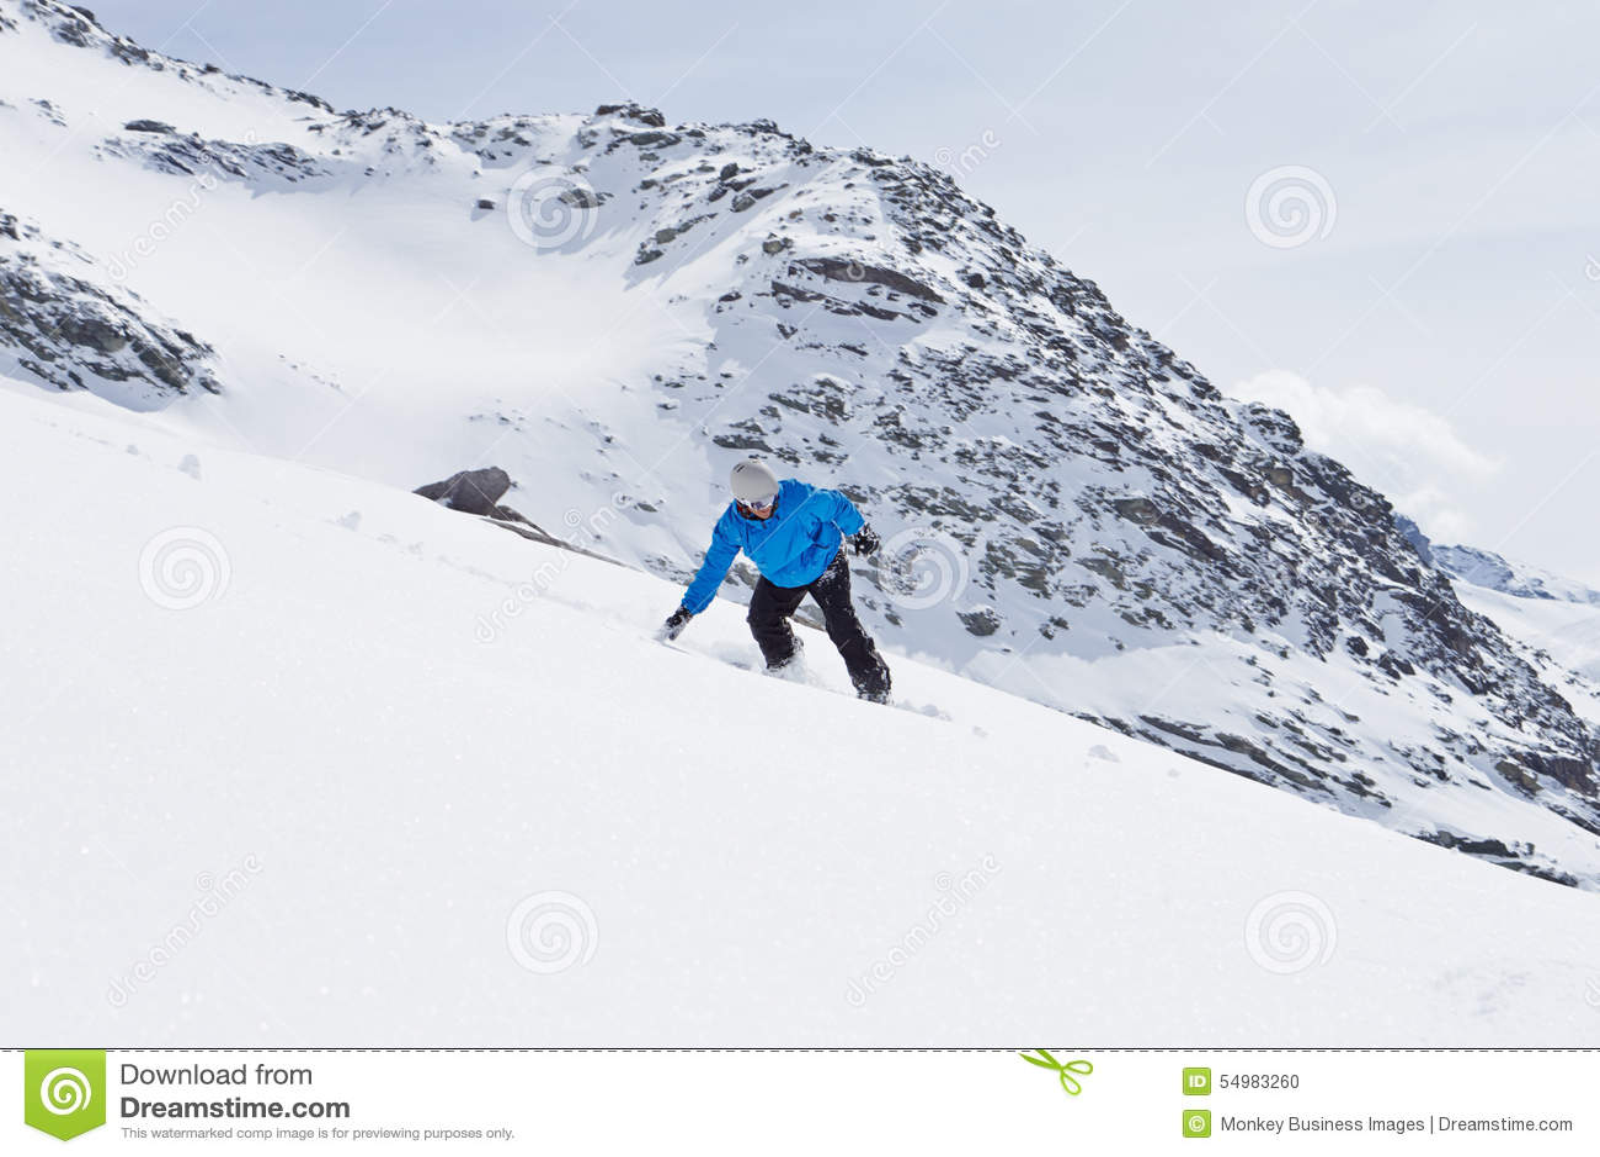 ManSnowboarding på Ski Holiday In Mountains